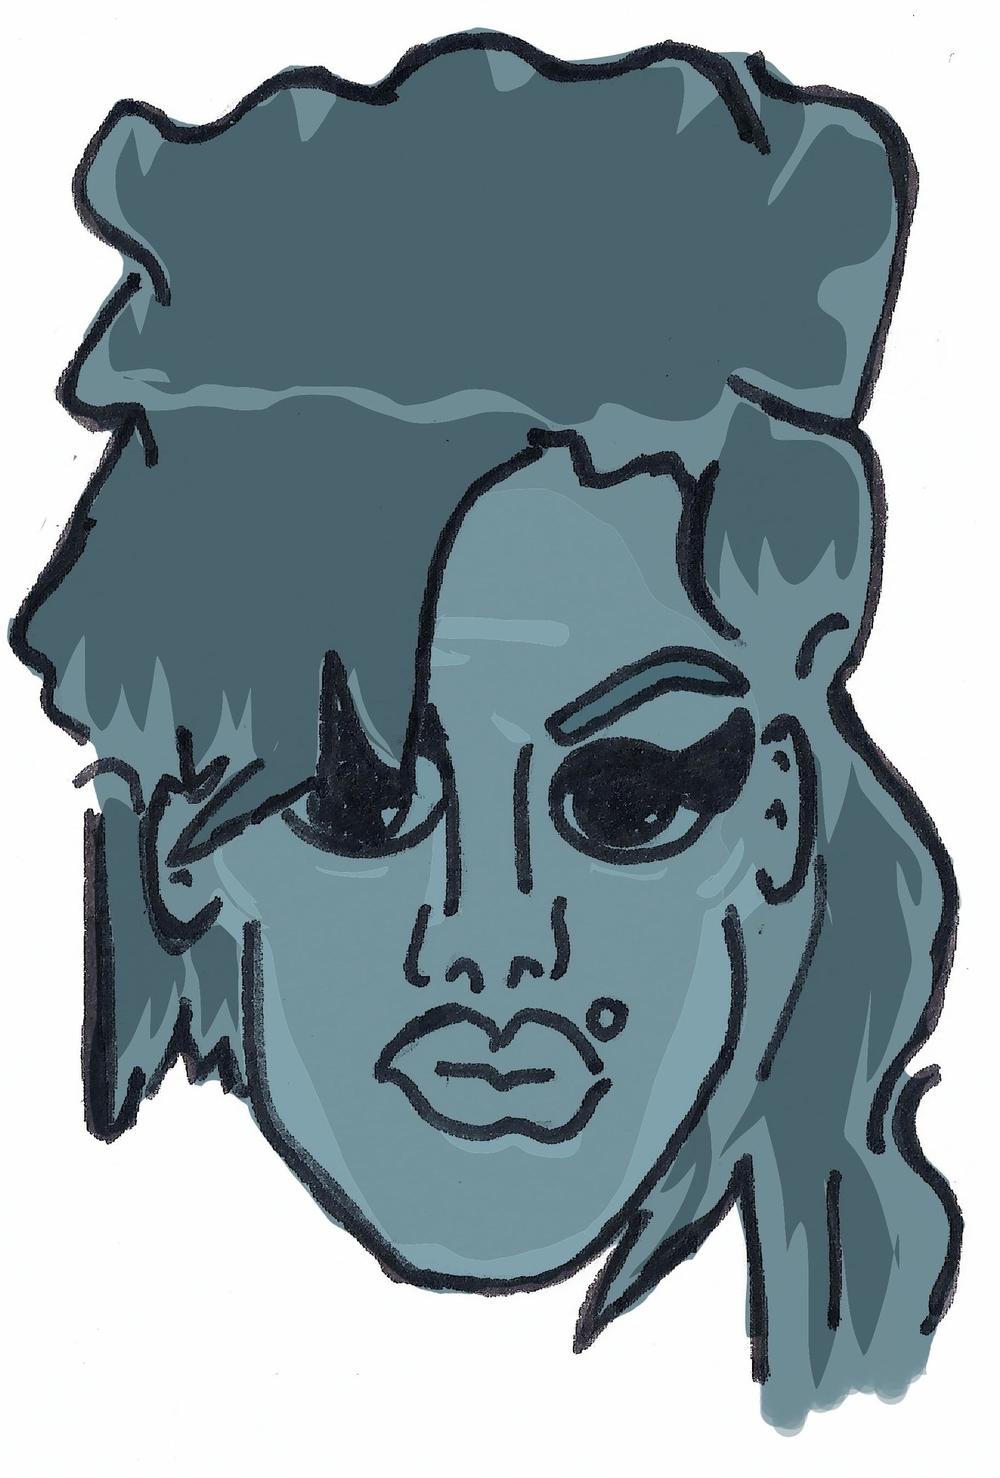 Amy WinehouseIllustration by Thomas